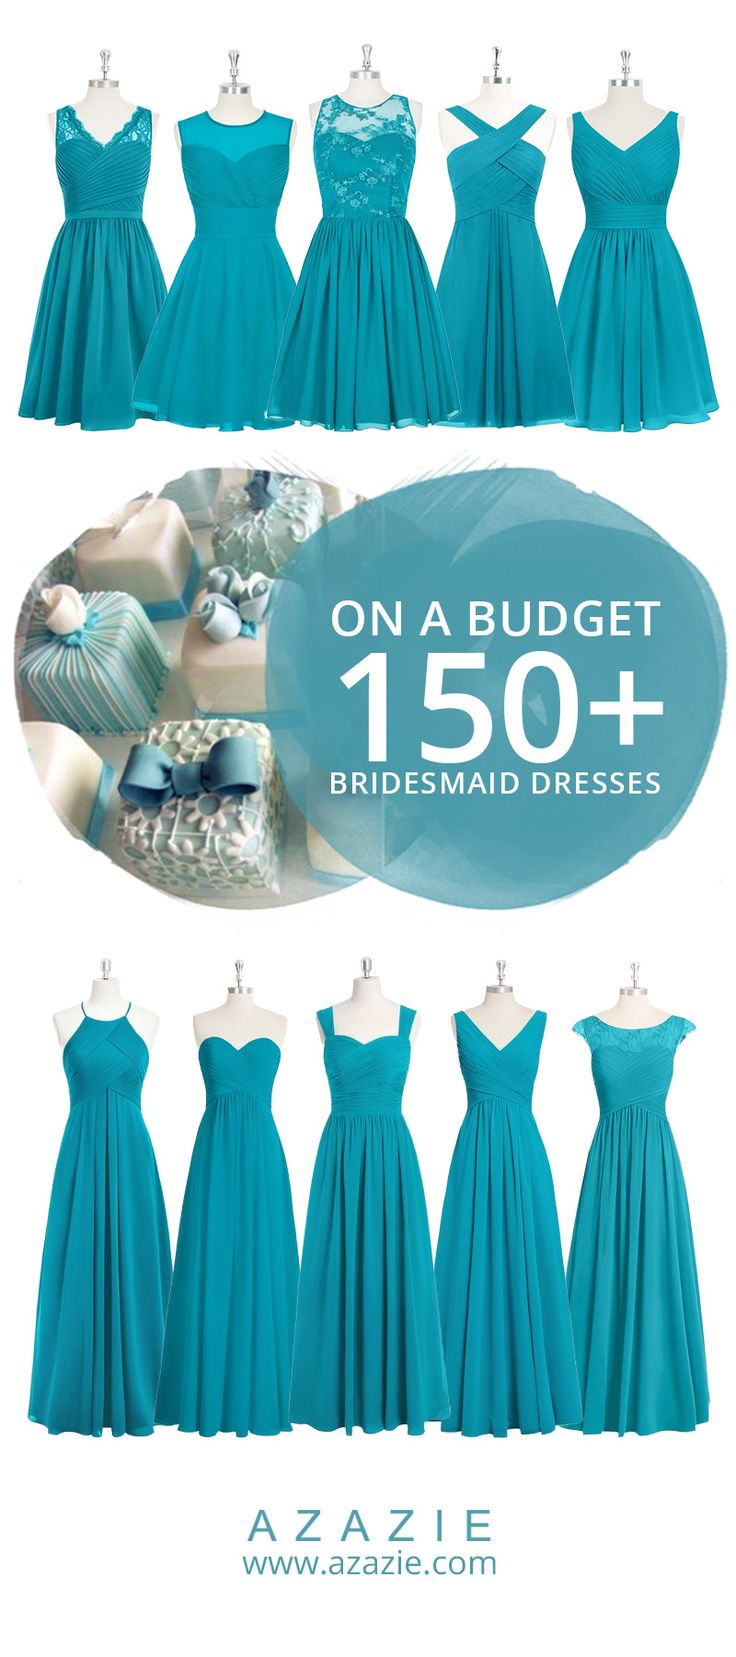 46 best Spring Wedding Ideas images on Pinterest | Wedding ideas ...